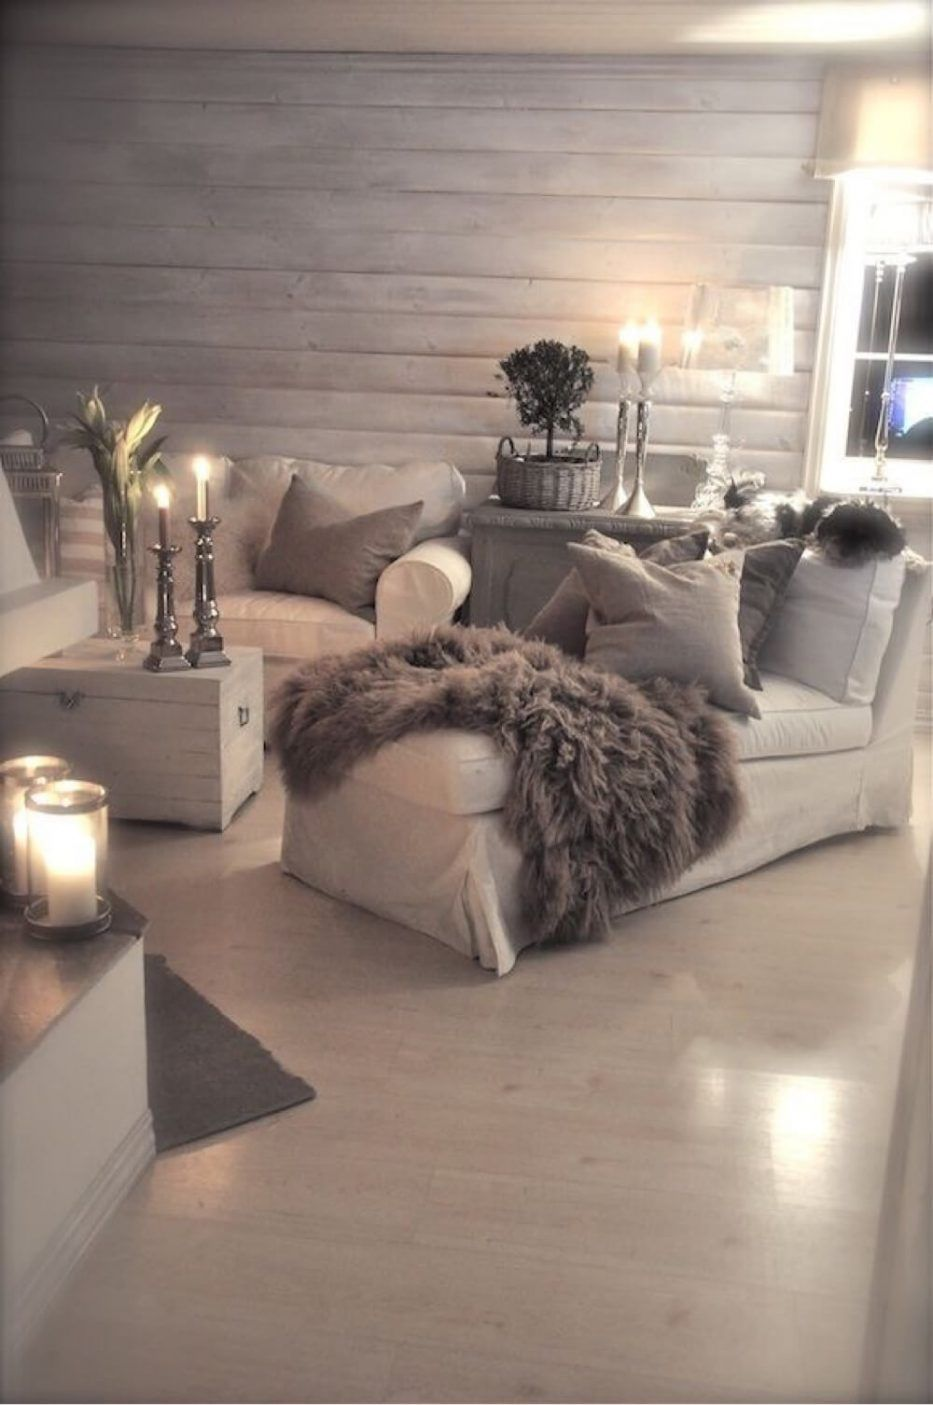 apartments modern glam living room ideas mimiku decor a on diy home decor on a budget apartment ideas id=22470